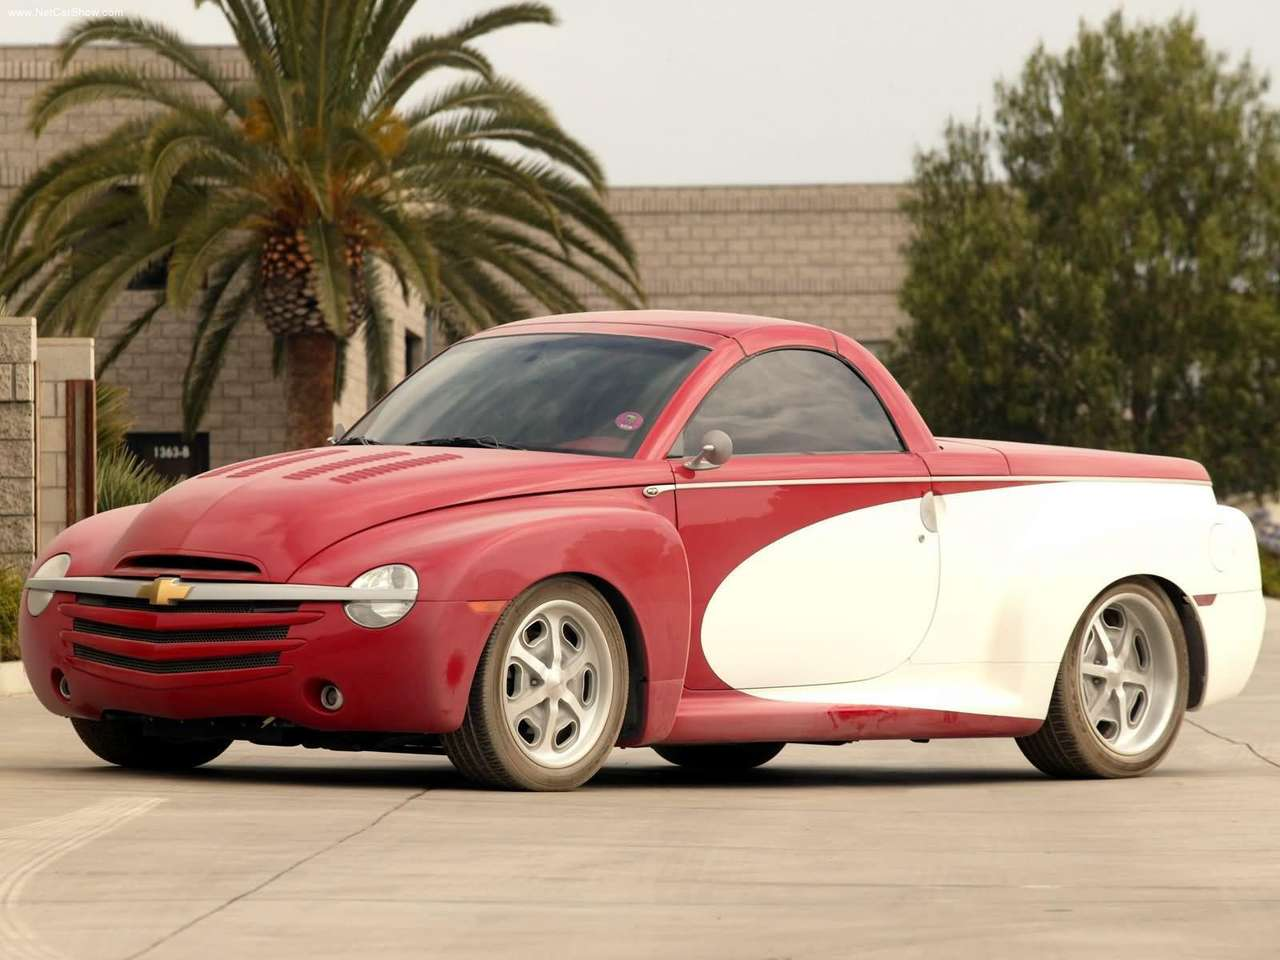 Chevrolet Socal